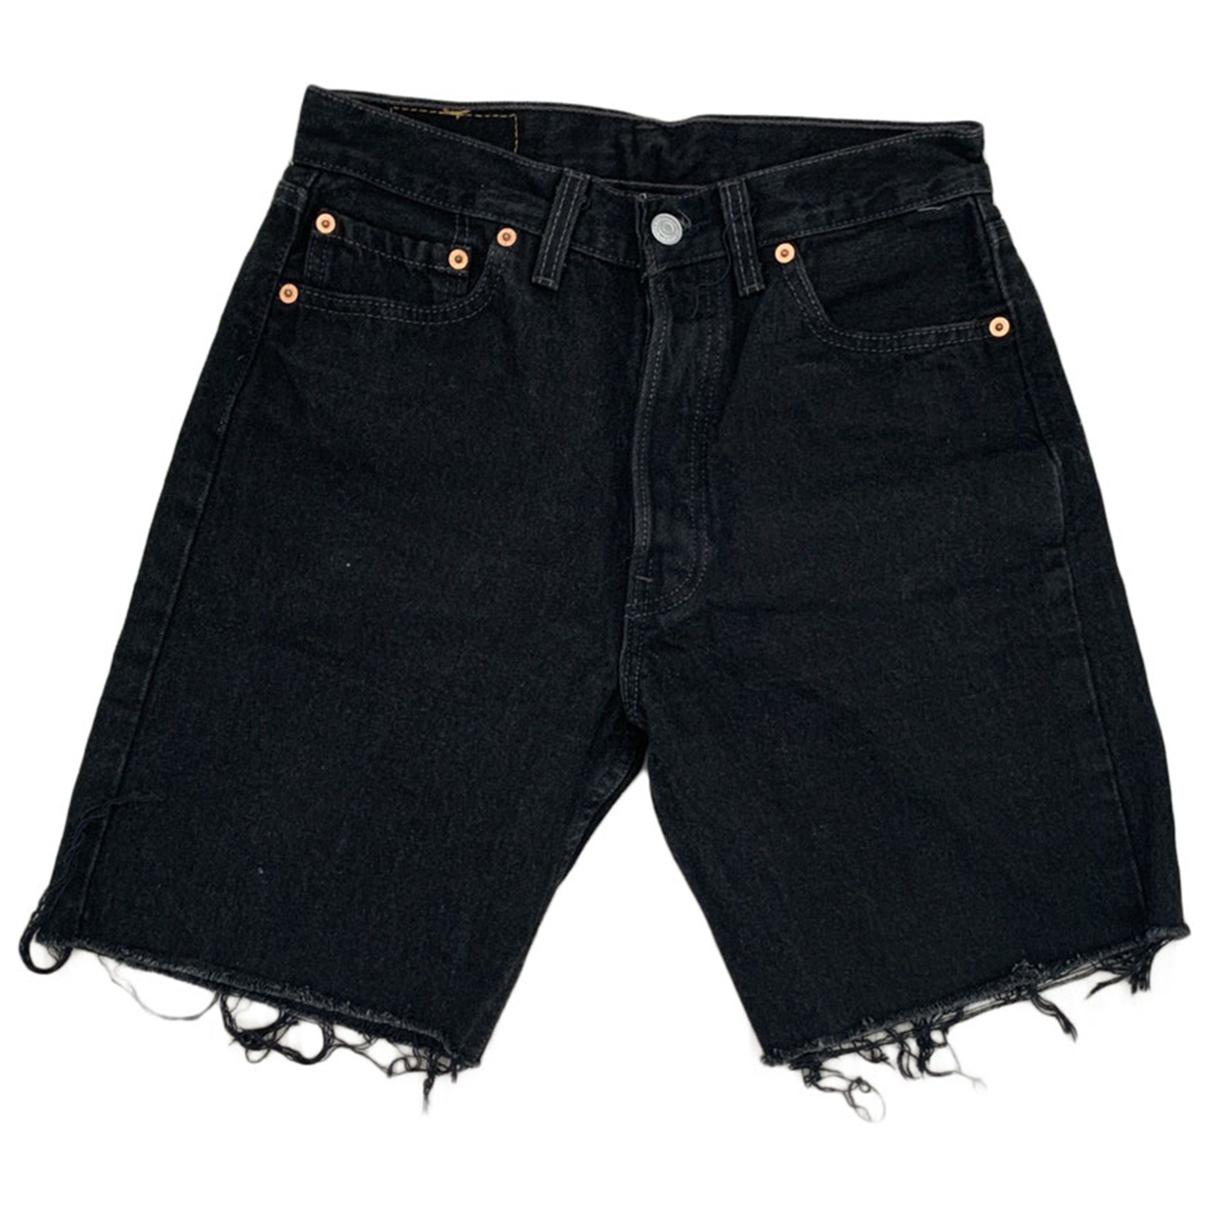 Levis Vintage Clothing \N Shorts in  Schwarz Baumwolle